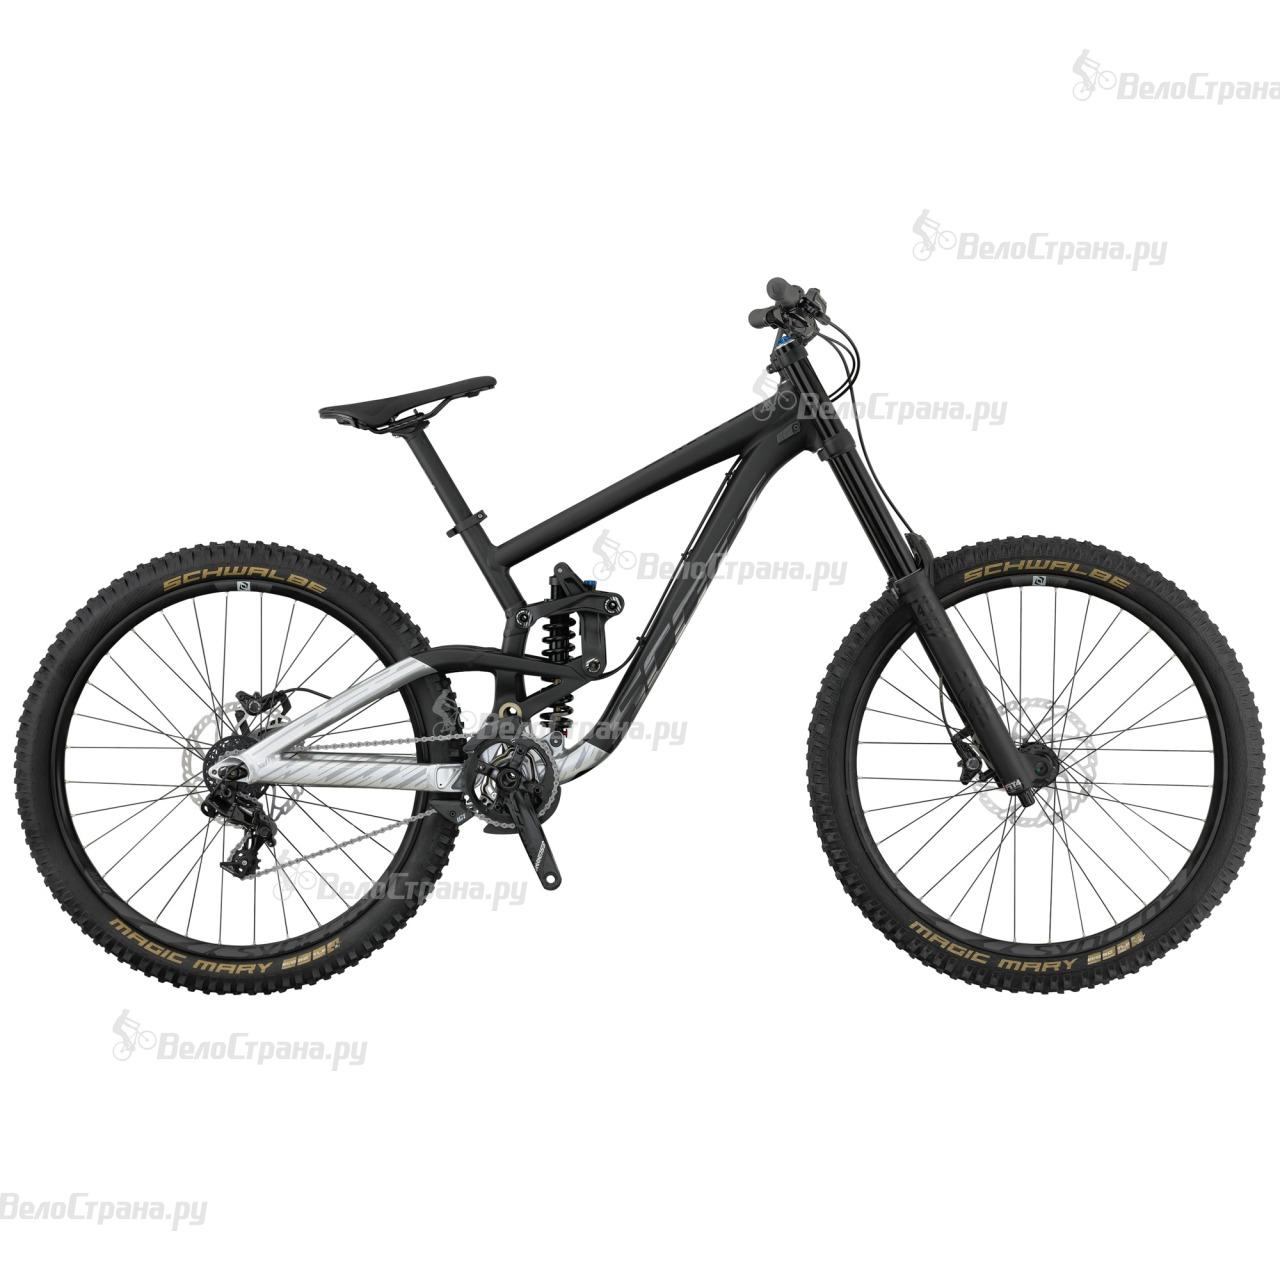 Велосипед Scott Gambler 720 (2017) велосипед scott gambler 720 2015